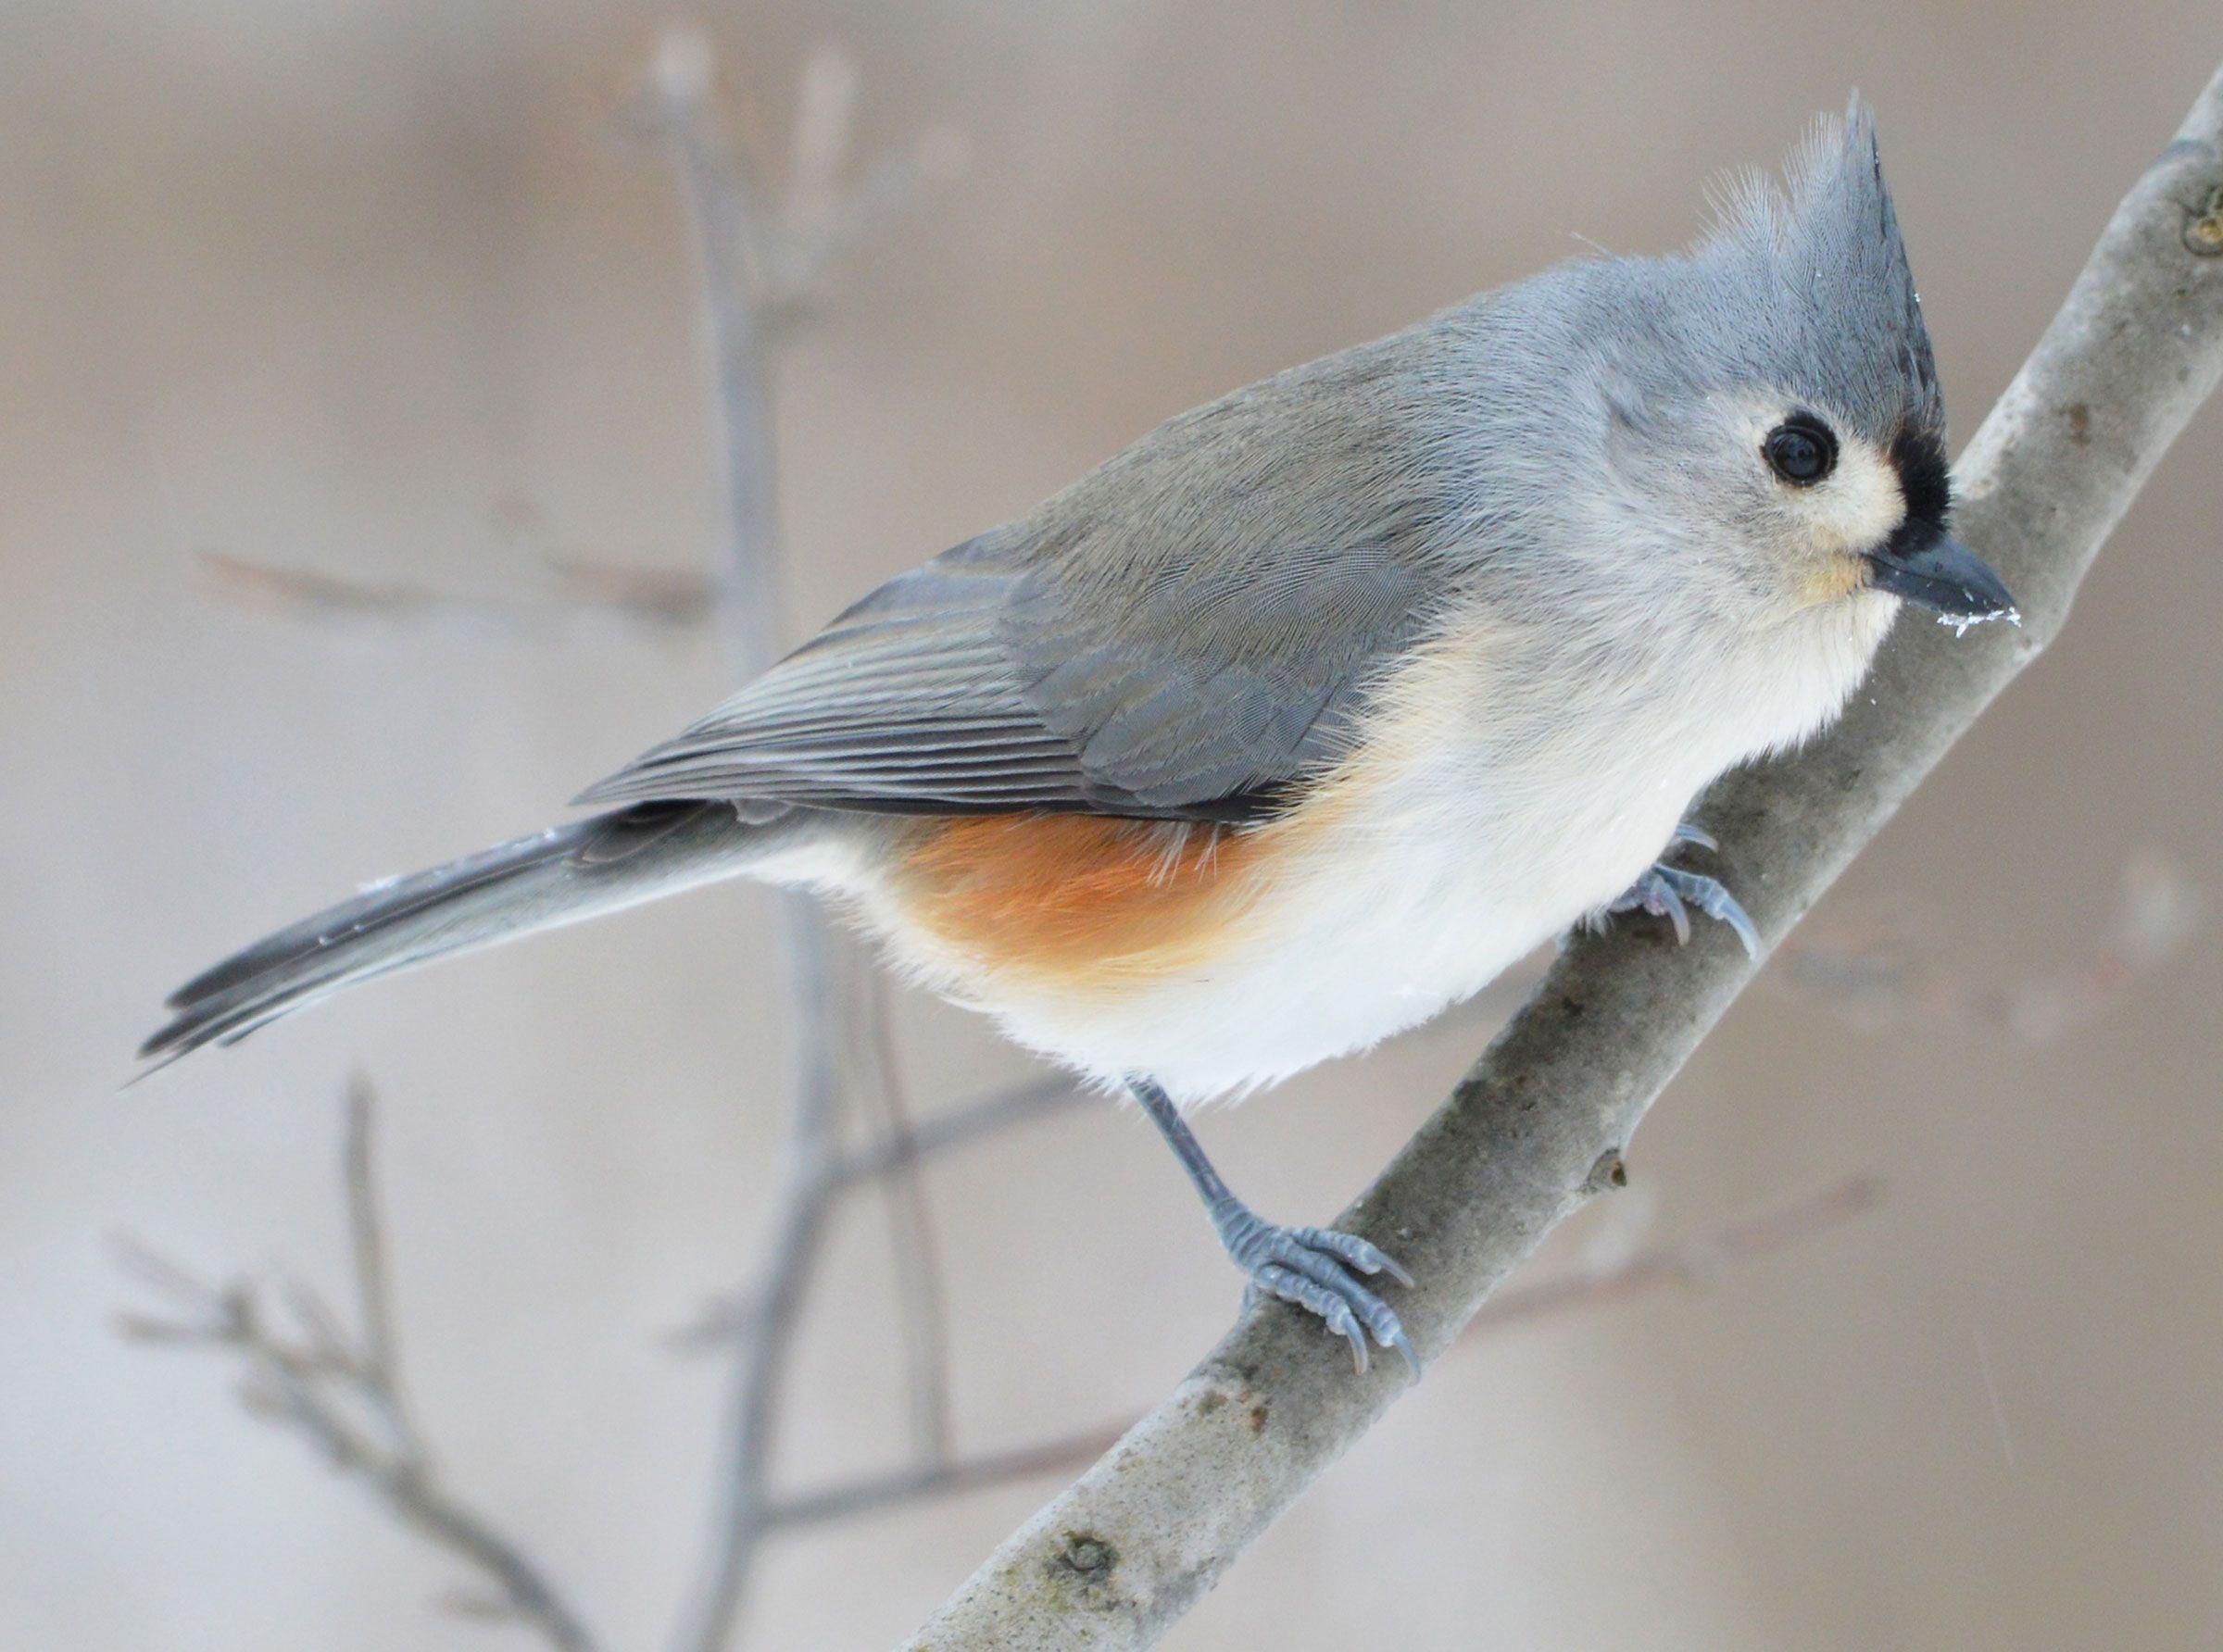 Get to Know These 15 Common Birds | Common birds, Birds ...